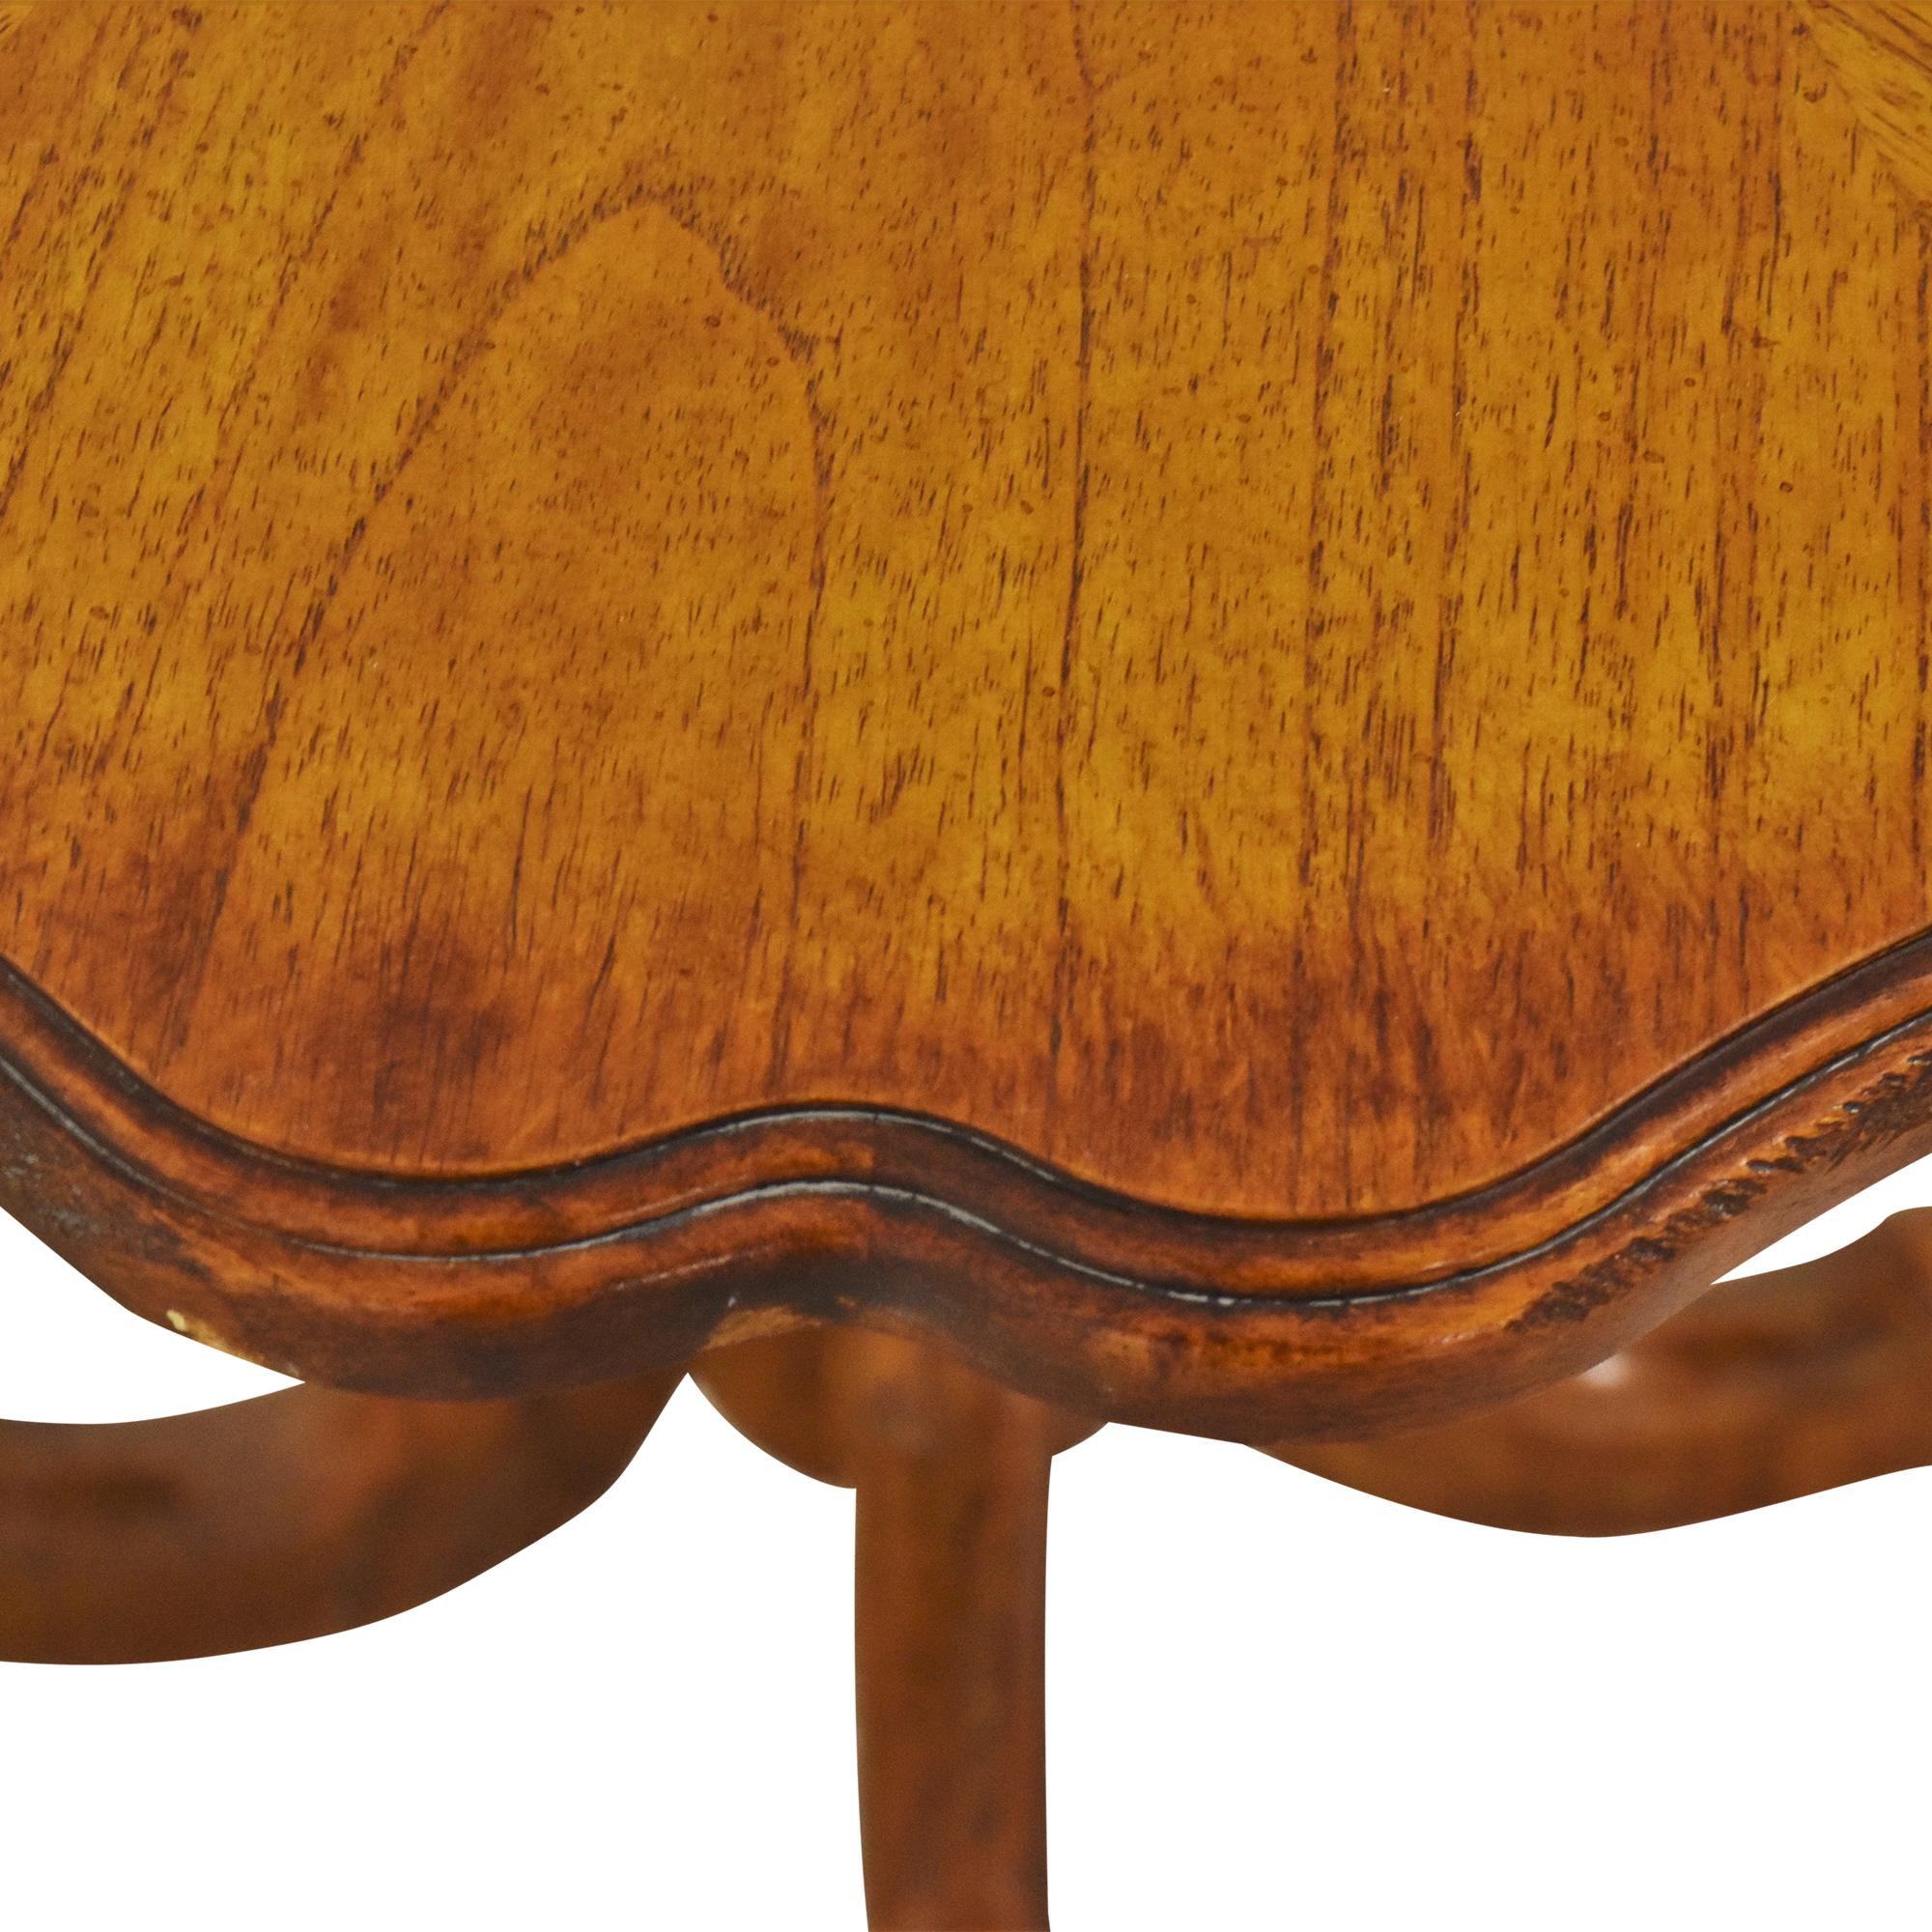 Hekman Furniture Hekman Furniture Pie Crust Table second hand